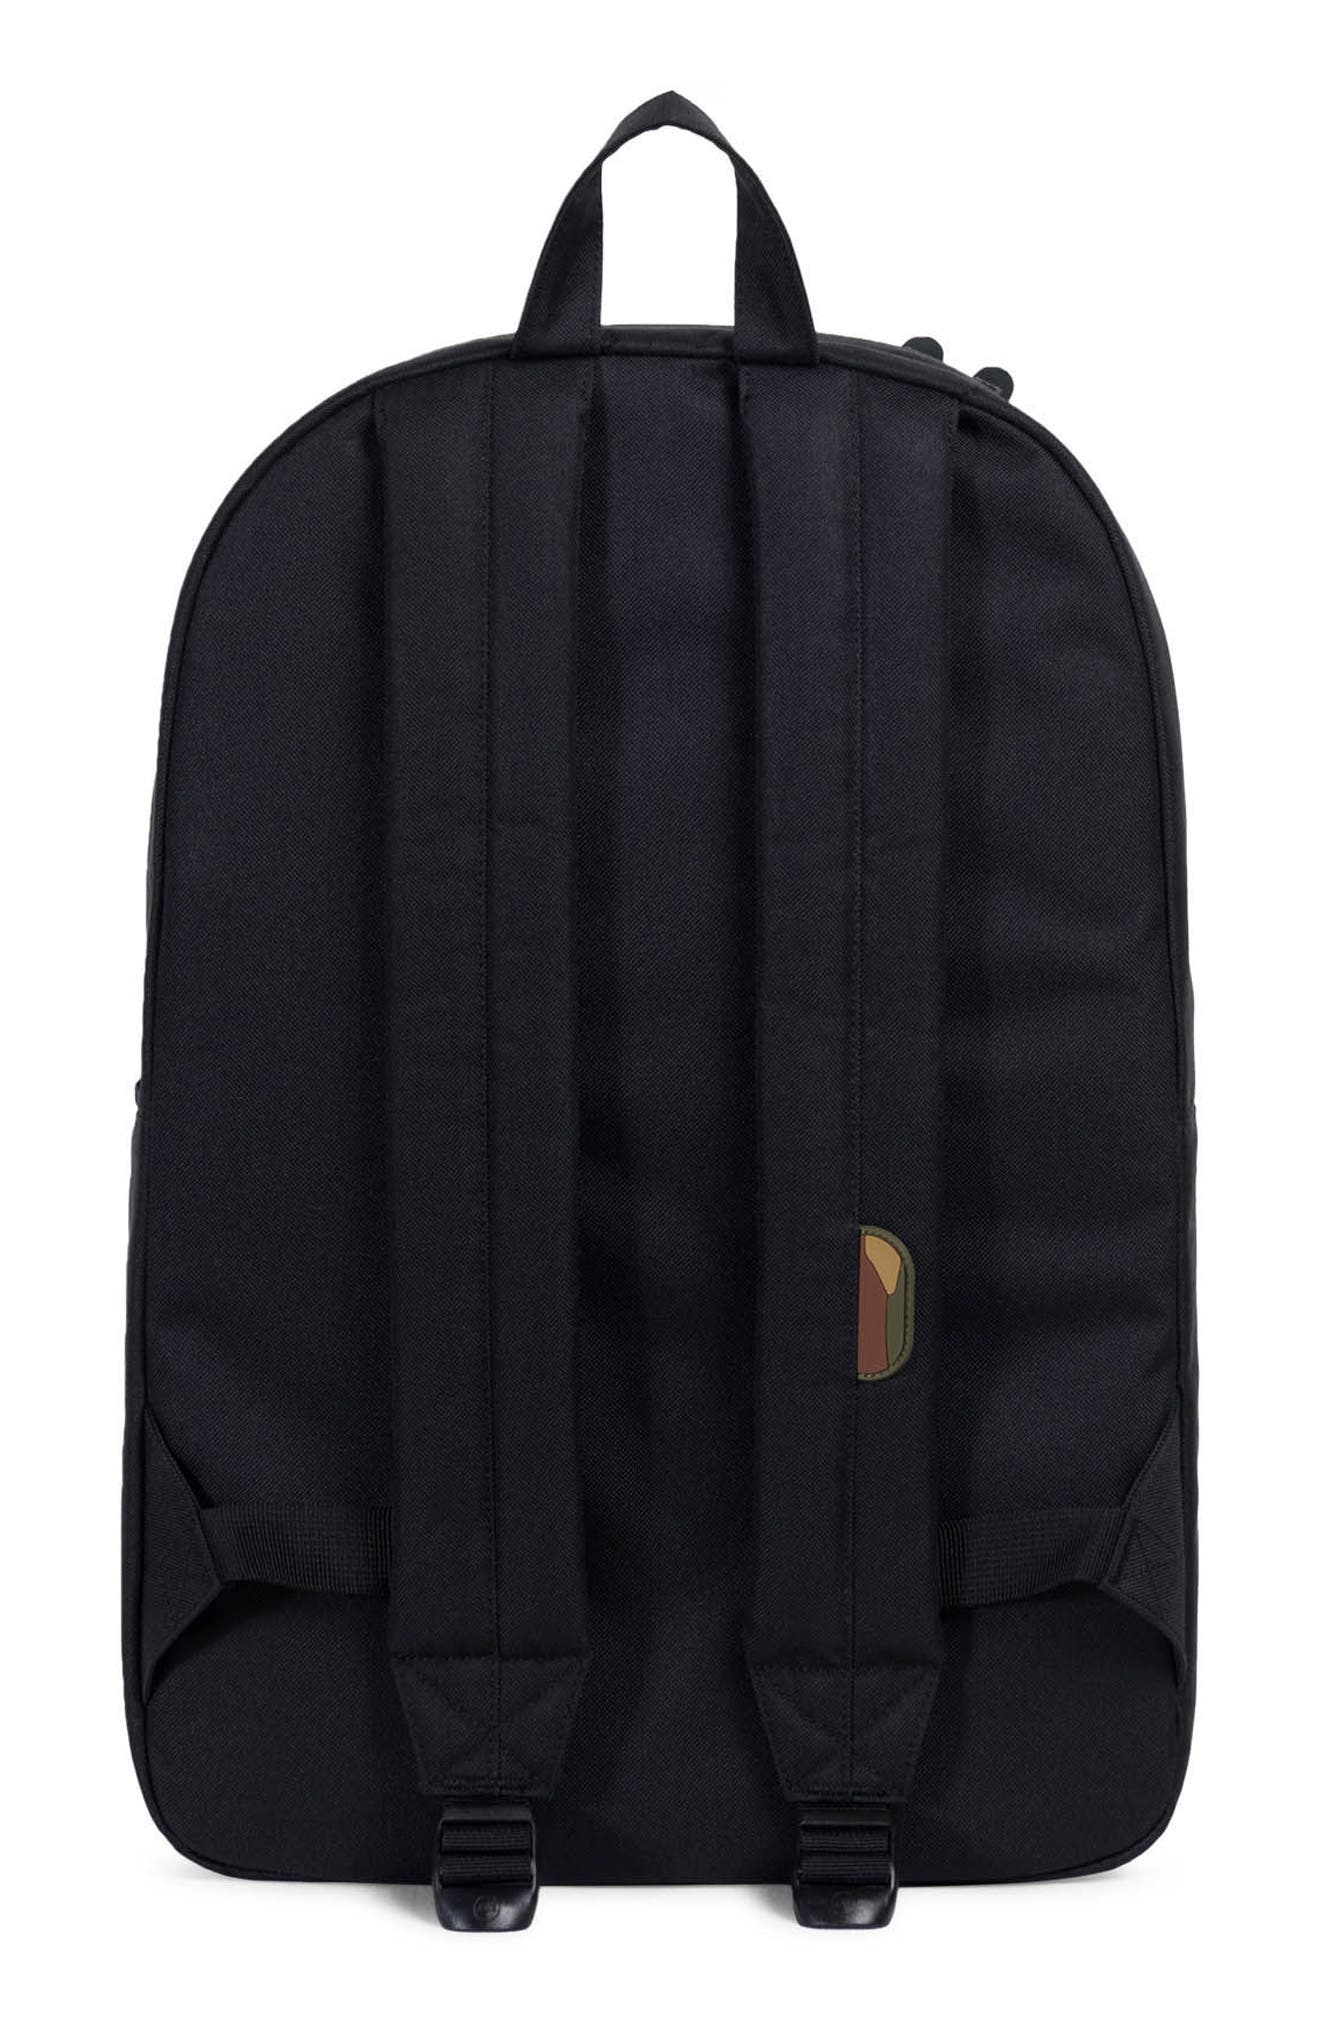 Heritage Reflective Backpack,                             Alternate thumbnail 2, color,                             Black/ Woodland Camo